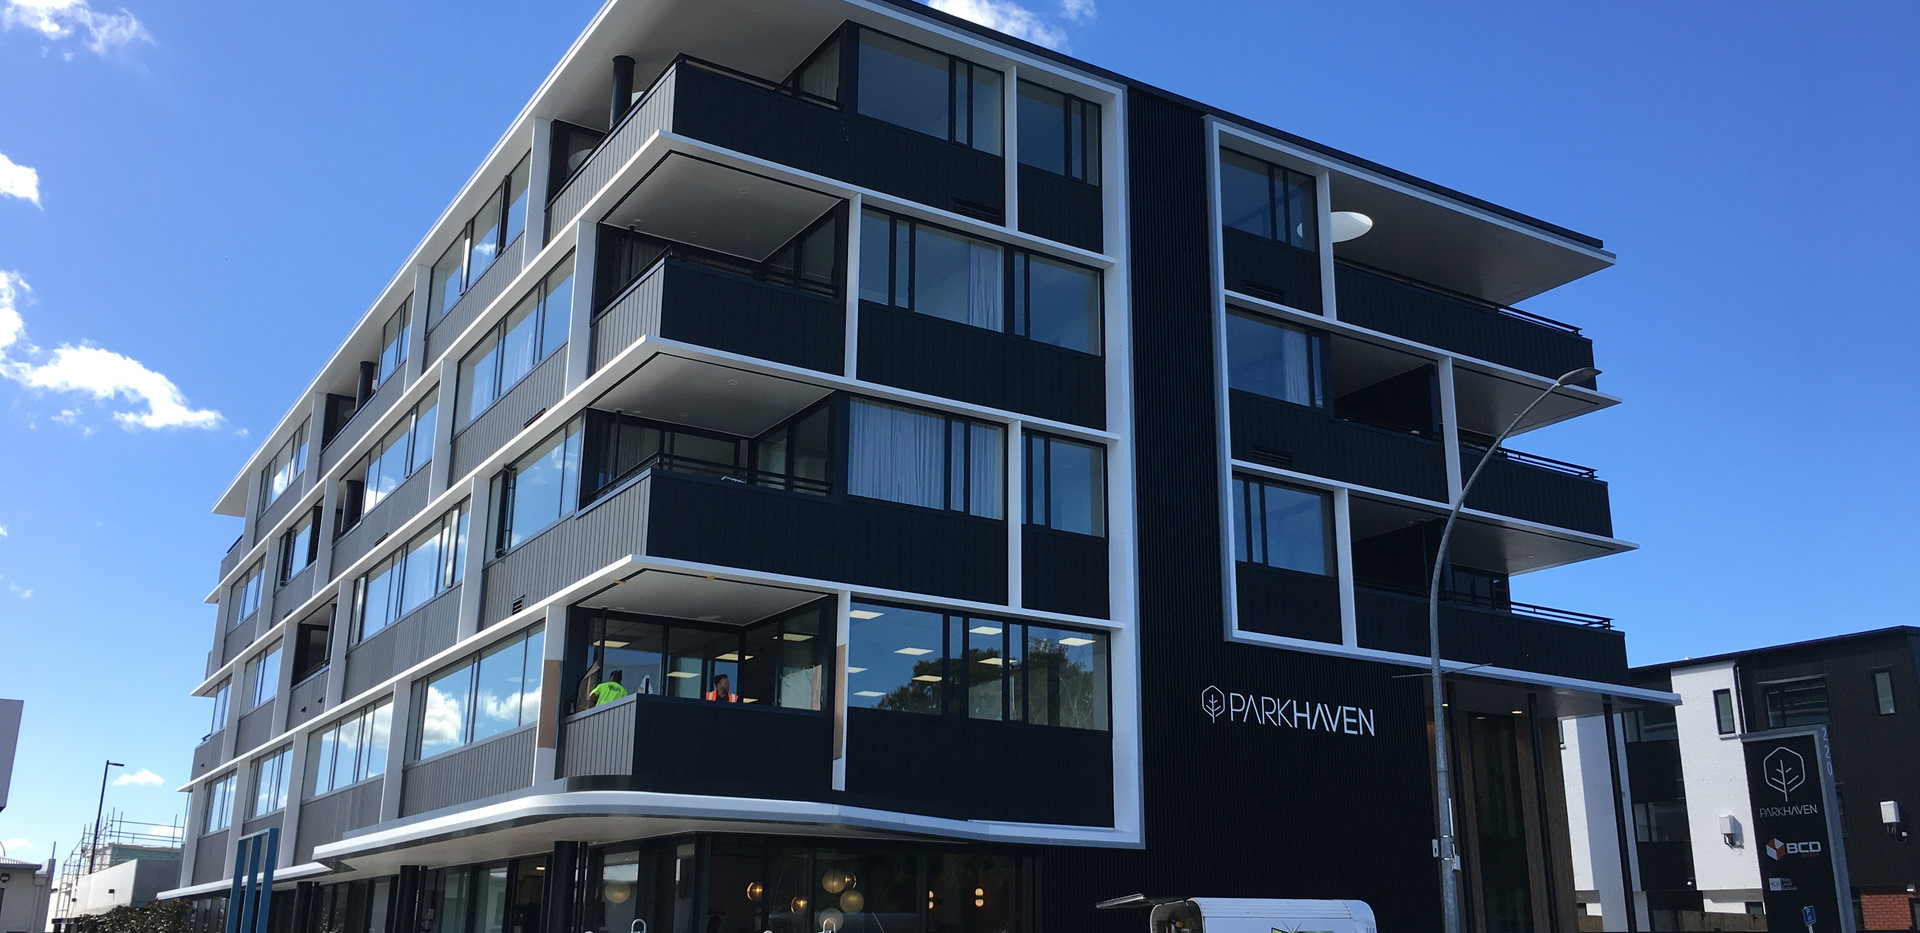 Park Haven 4 Watertight Construction